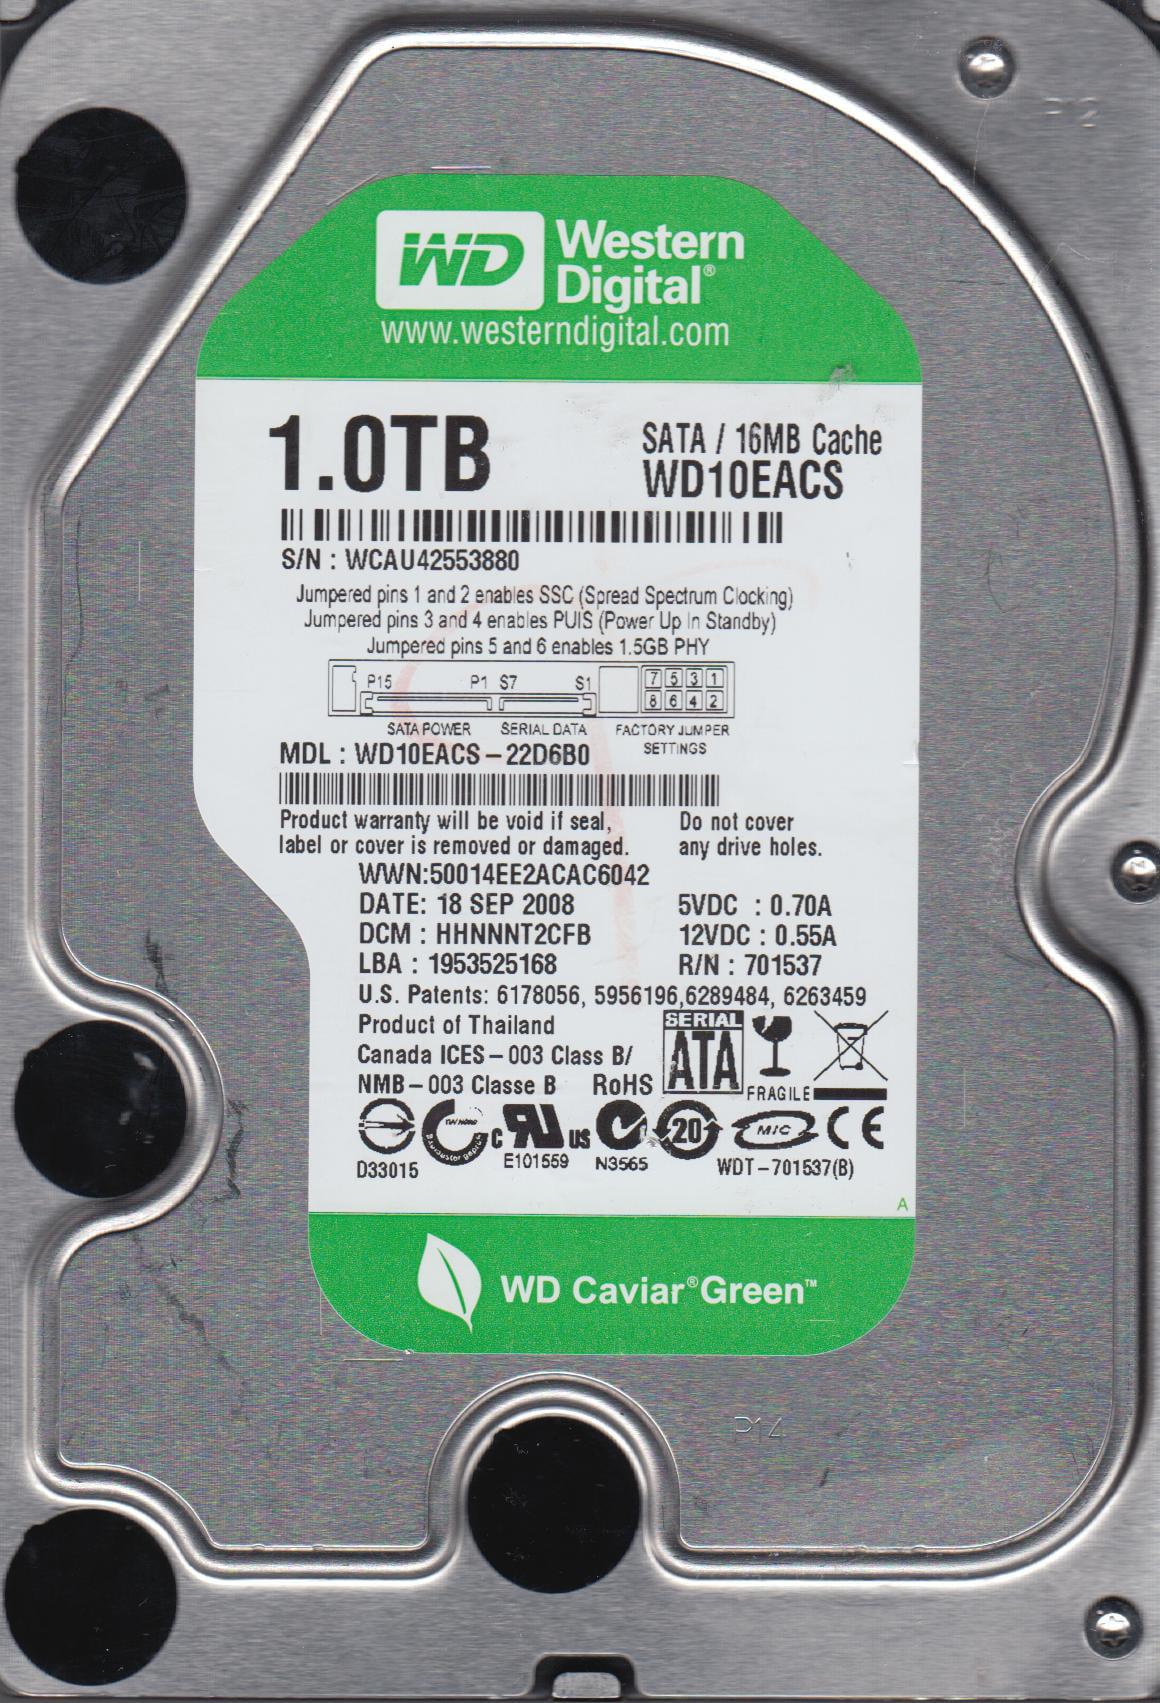 WD10EACS-22D6B0, DCM HHNNNT2CFB, Western Digital 1TB SATA 3 5 Hard Drive